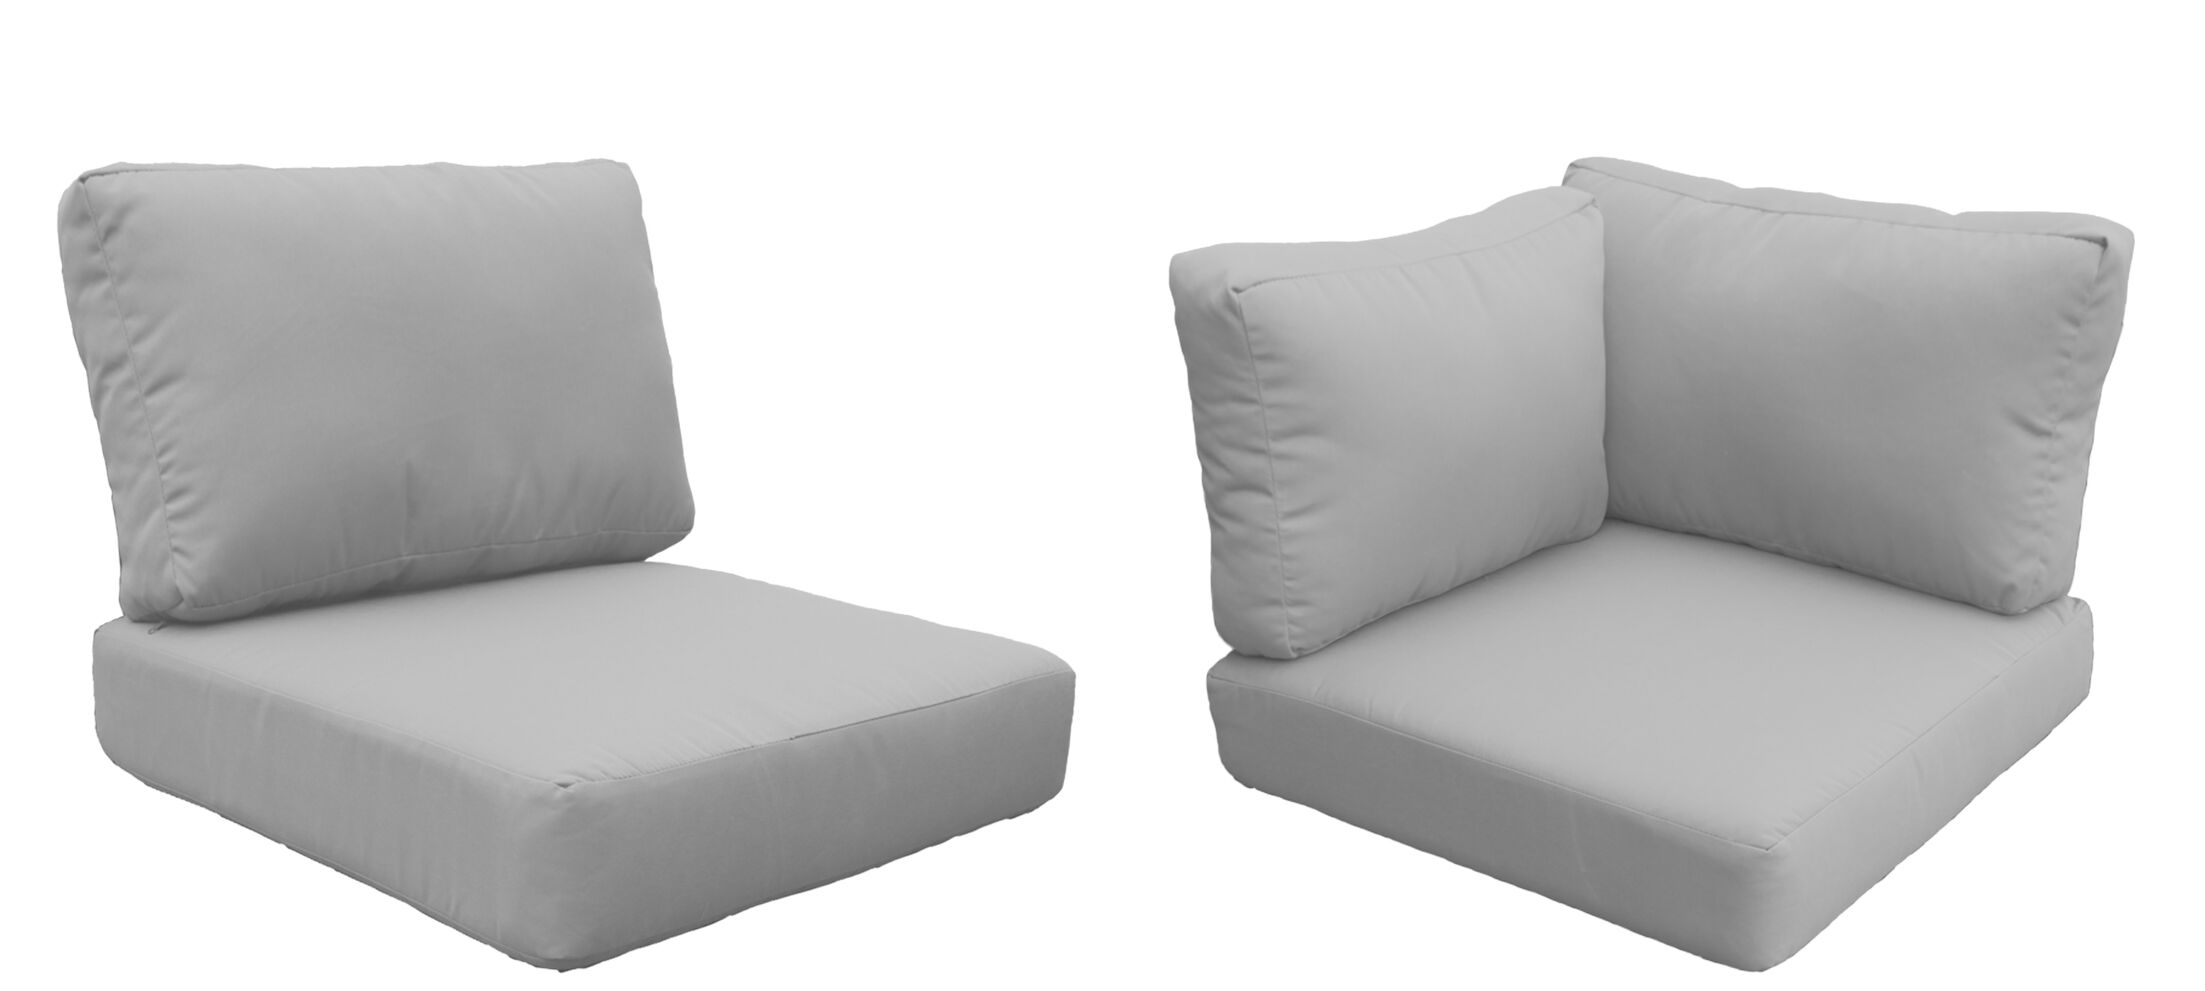 Fairmont 13 Piece OutdoorLounge Chair Cushion Set Fabric: Gray